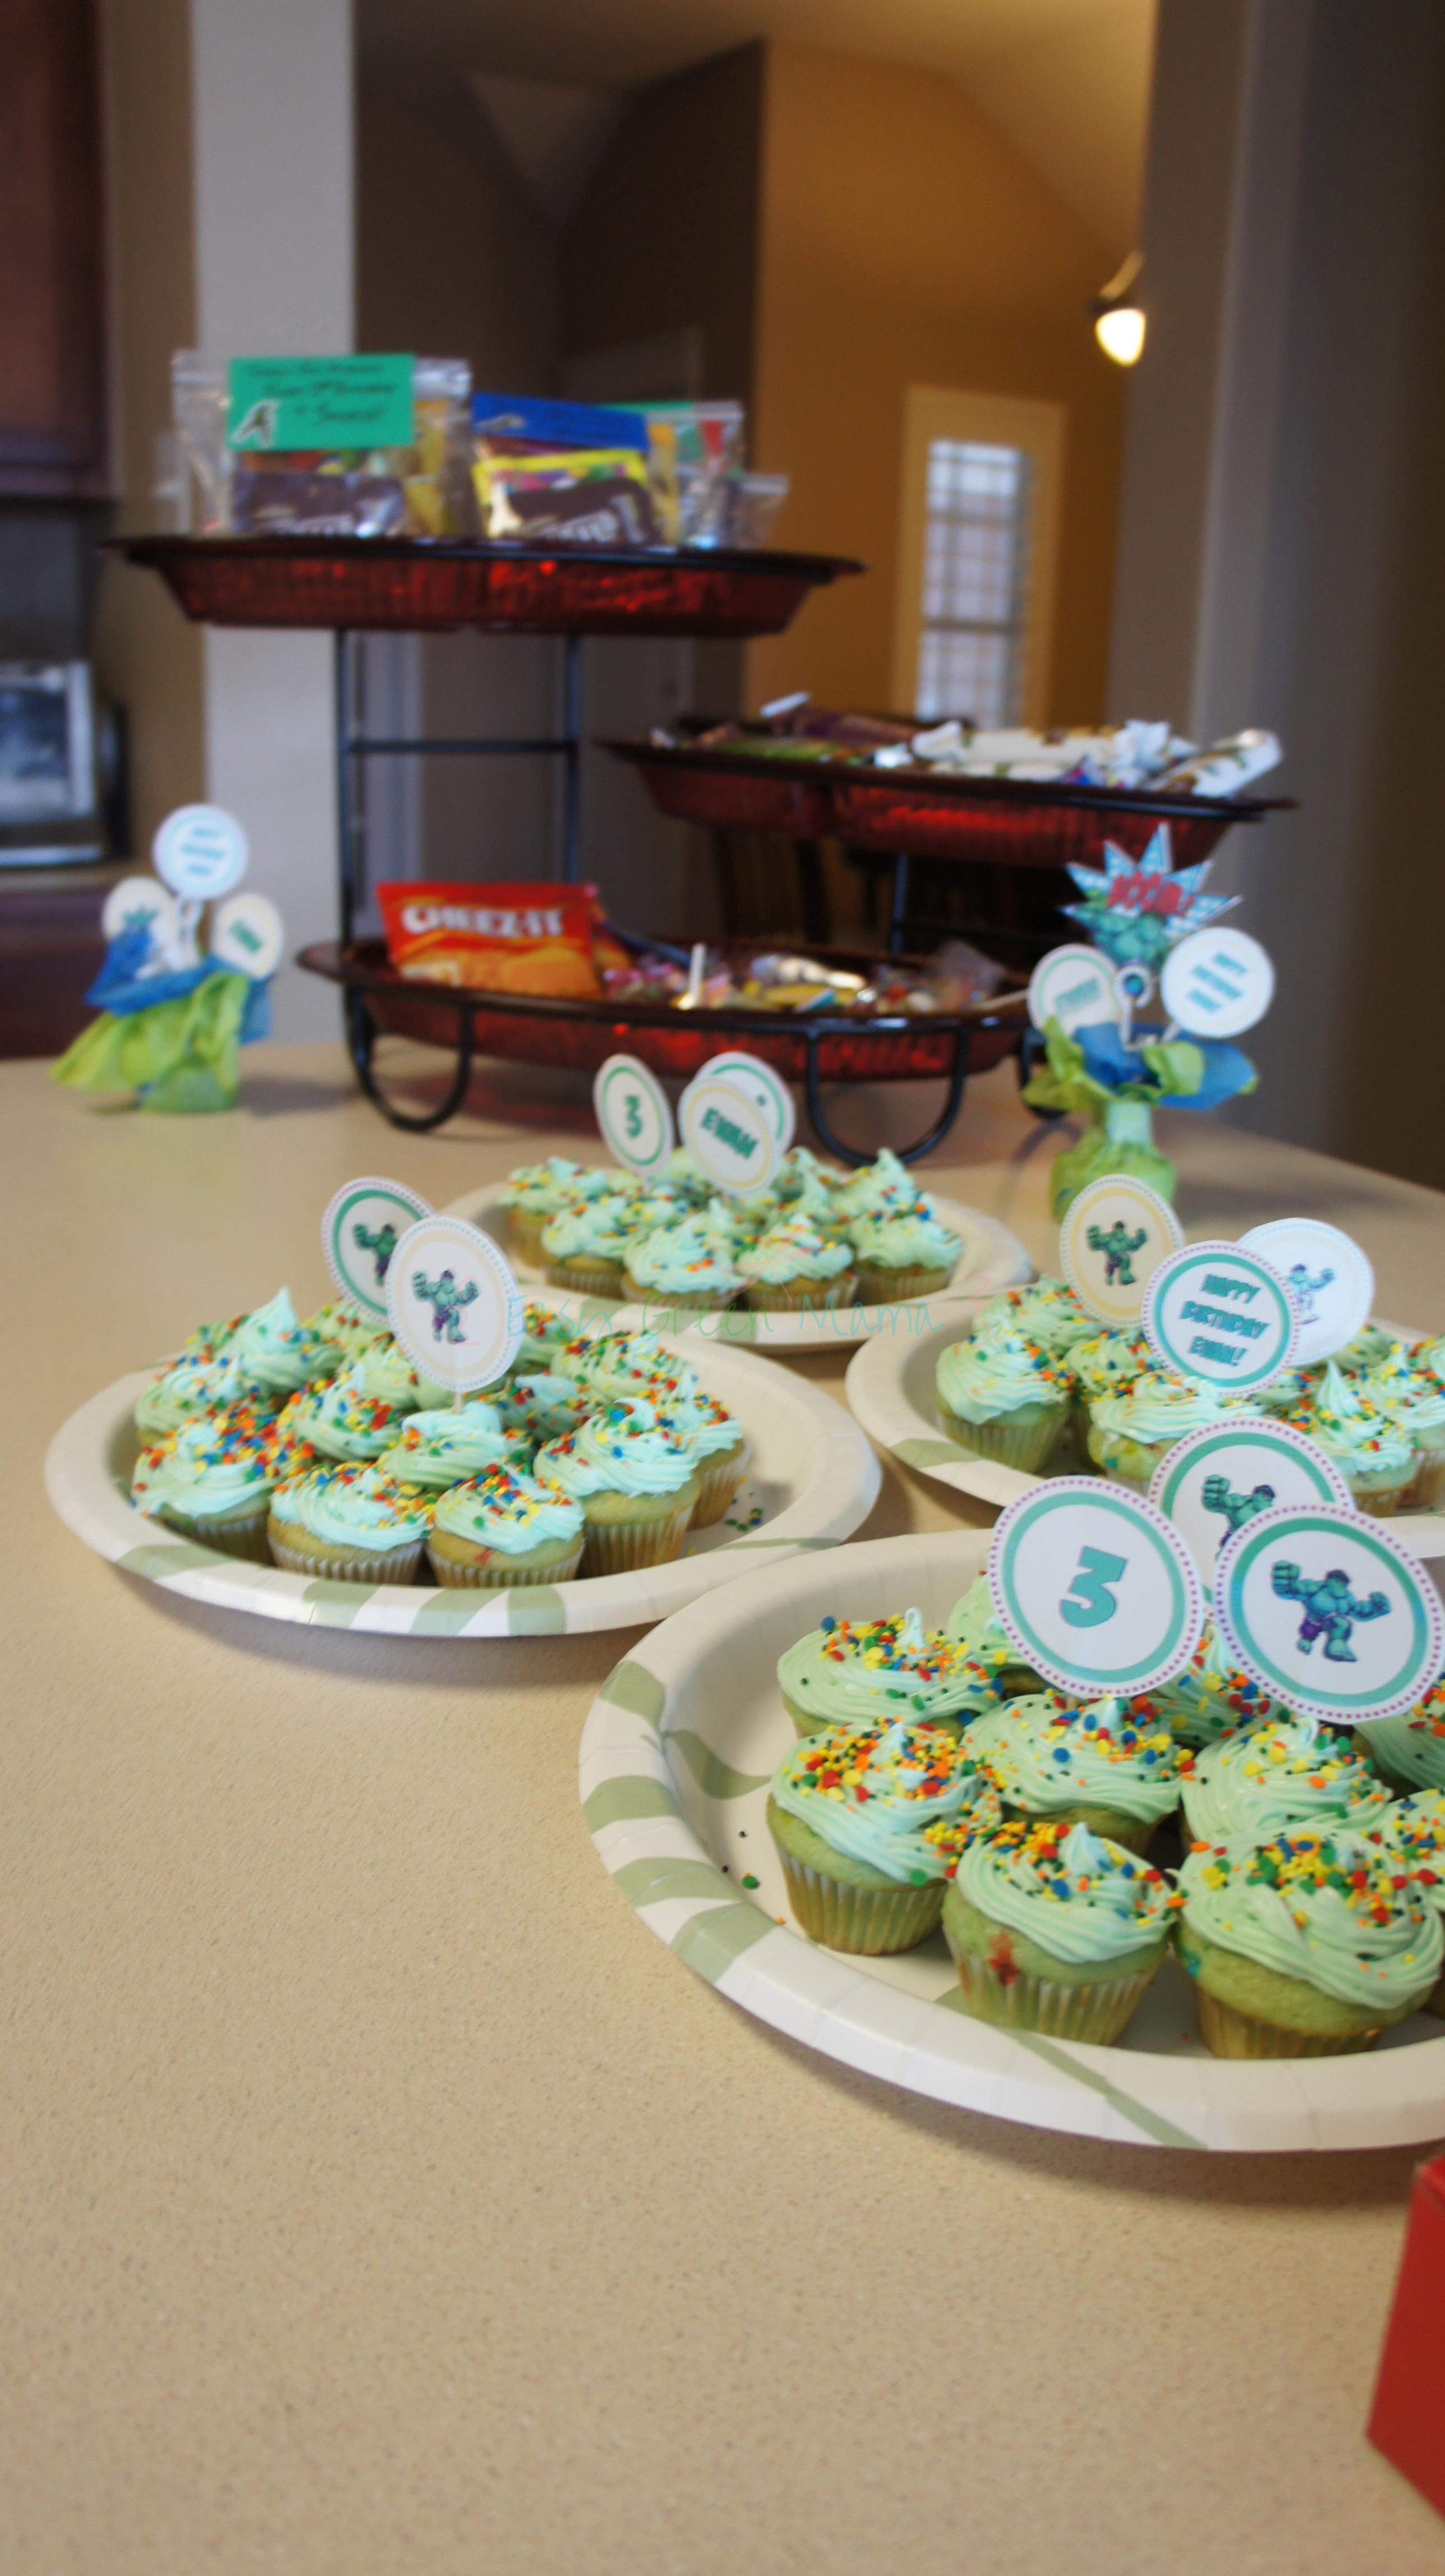 The Hulk Cake Decorations